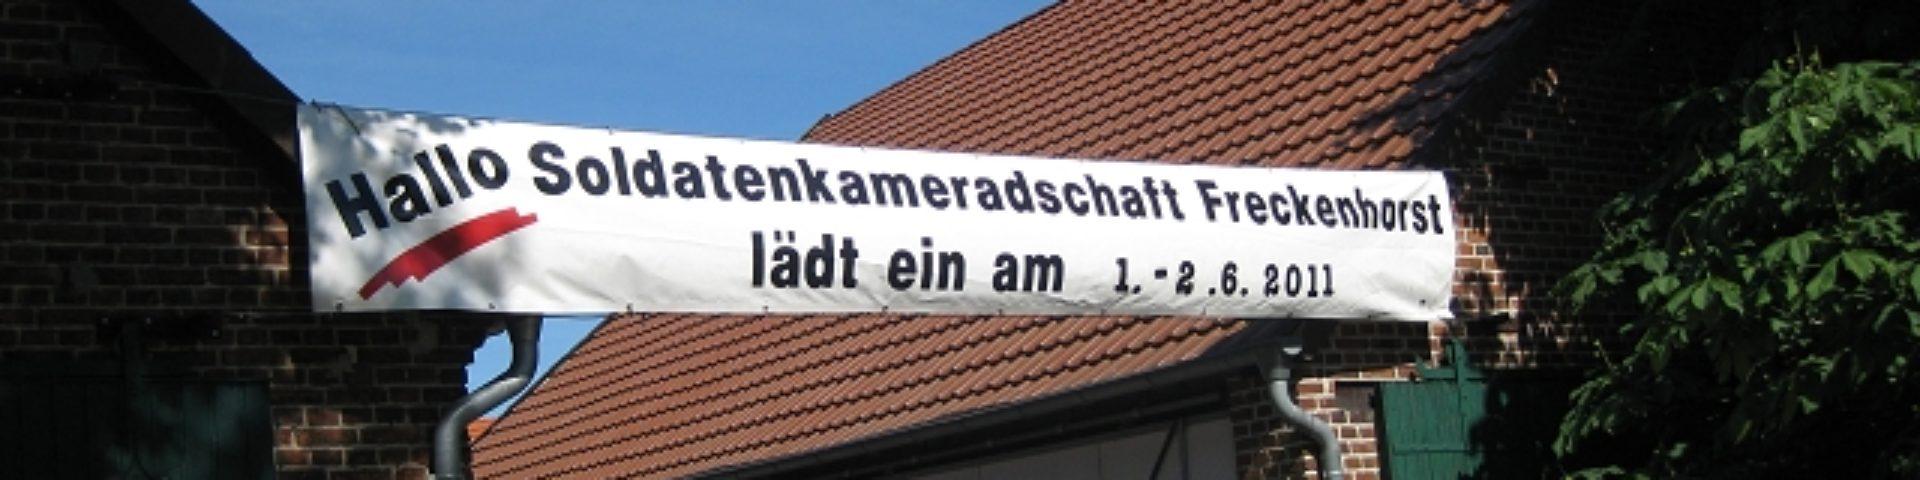 Soldatenkameradschaft Freckenhorst e.V.